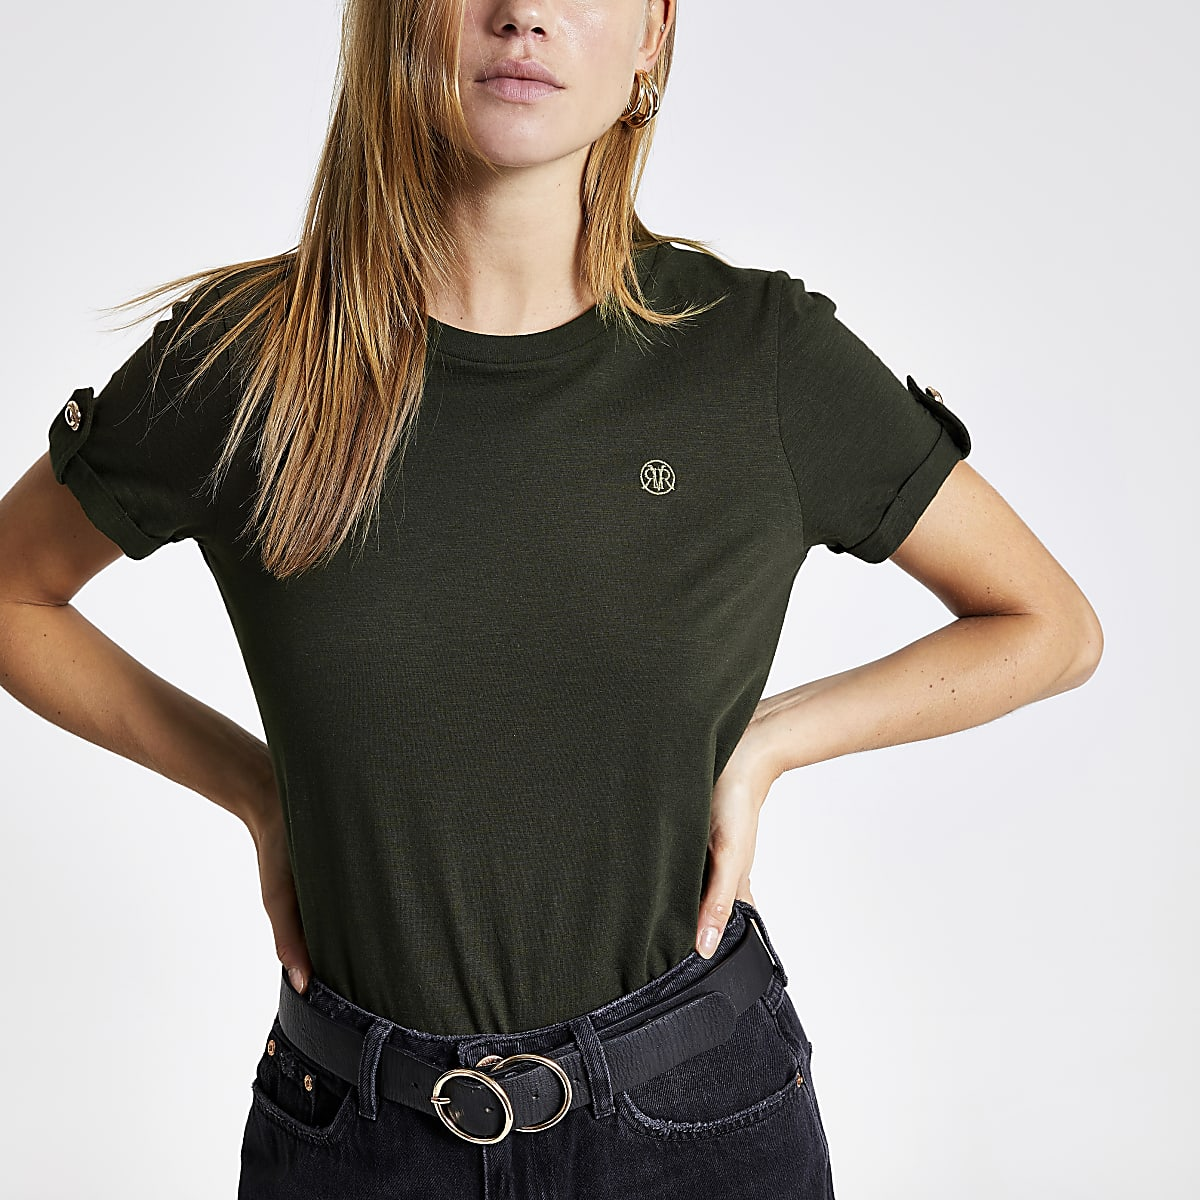 Kaki T-shirt met RI-logo en omgeslagen mouwen